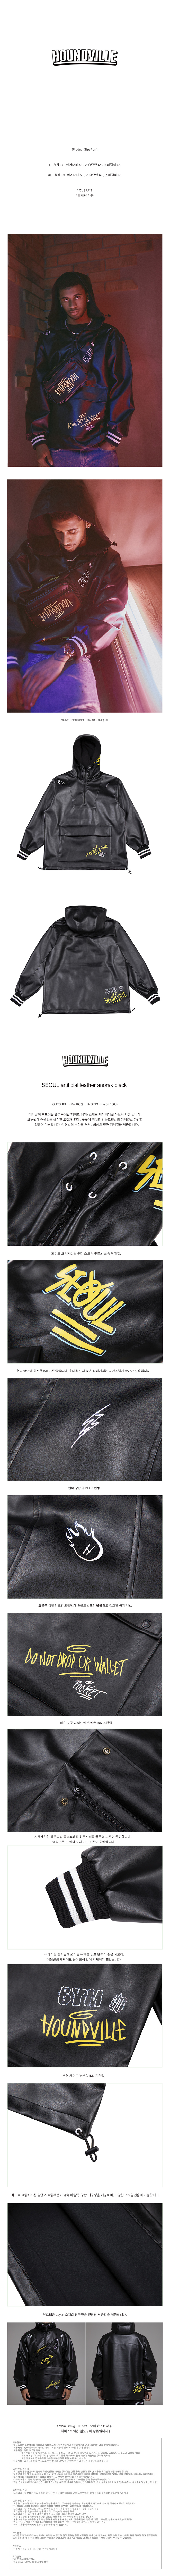 SEOUL artificial leather anorak black low.jpg